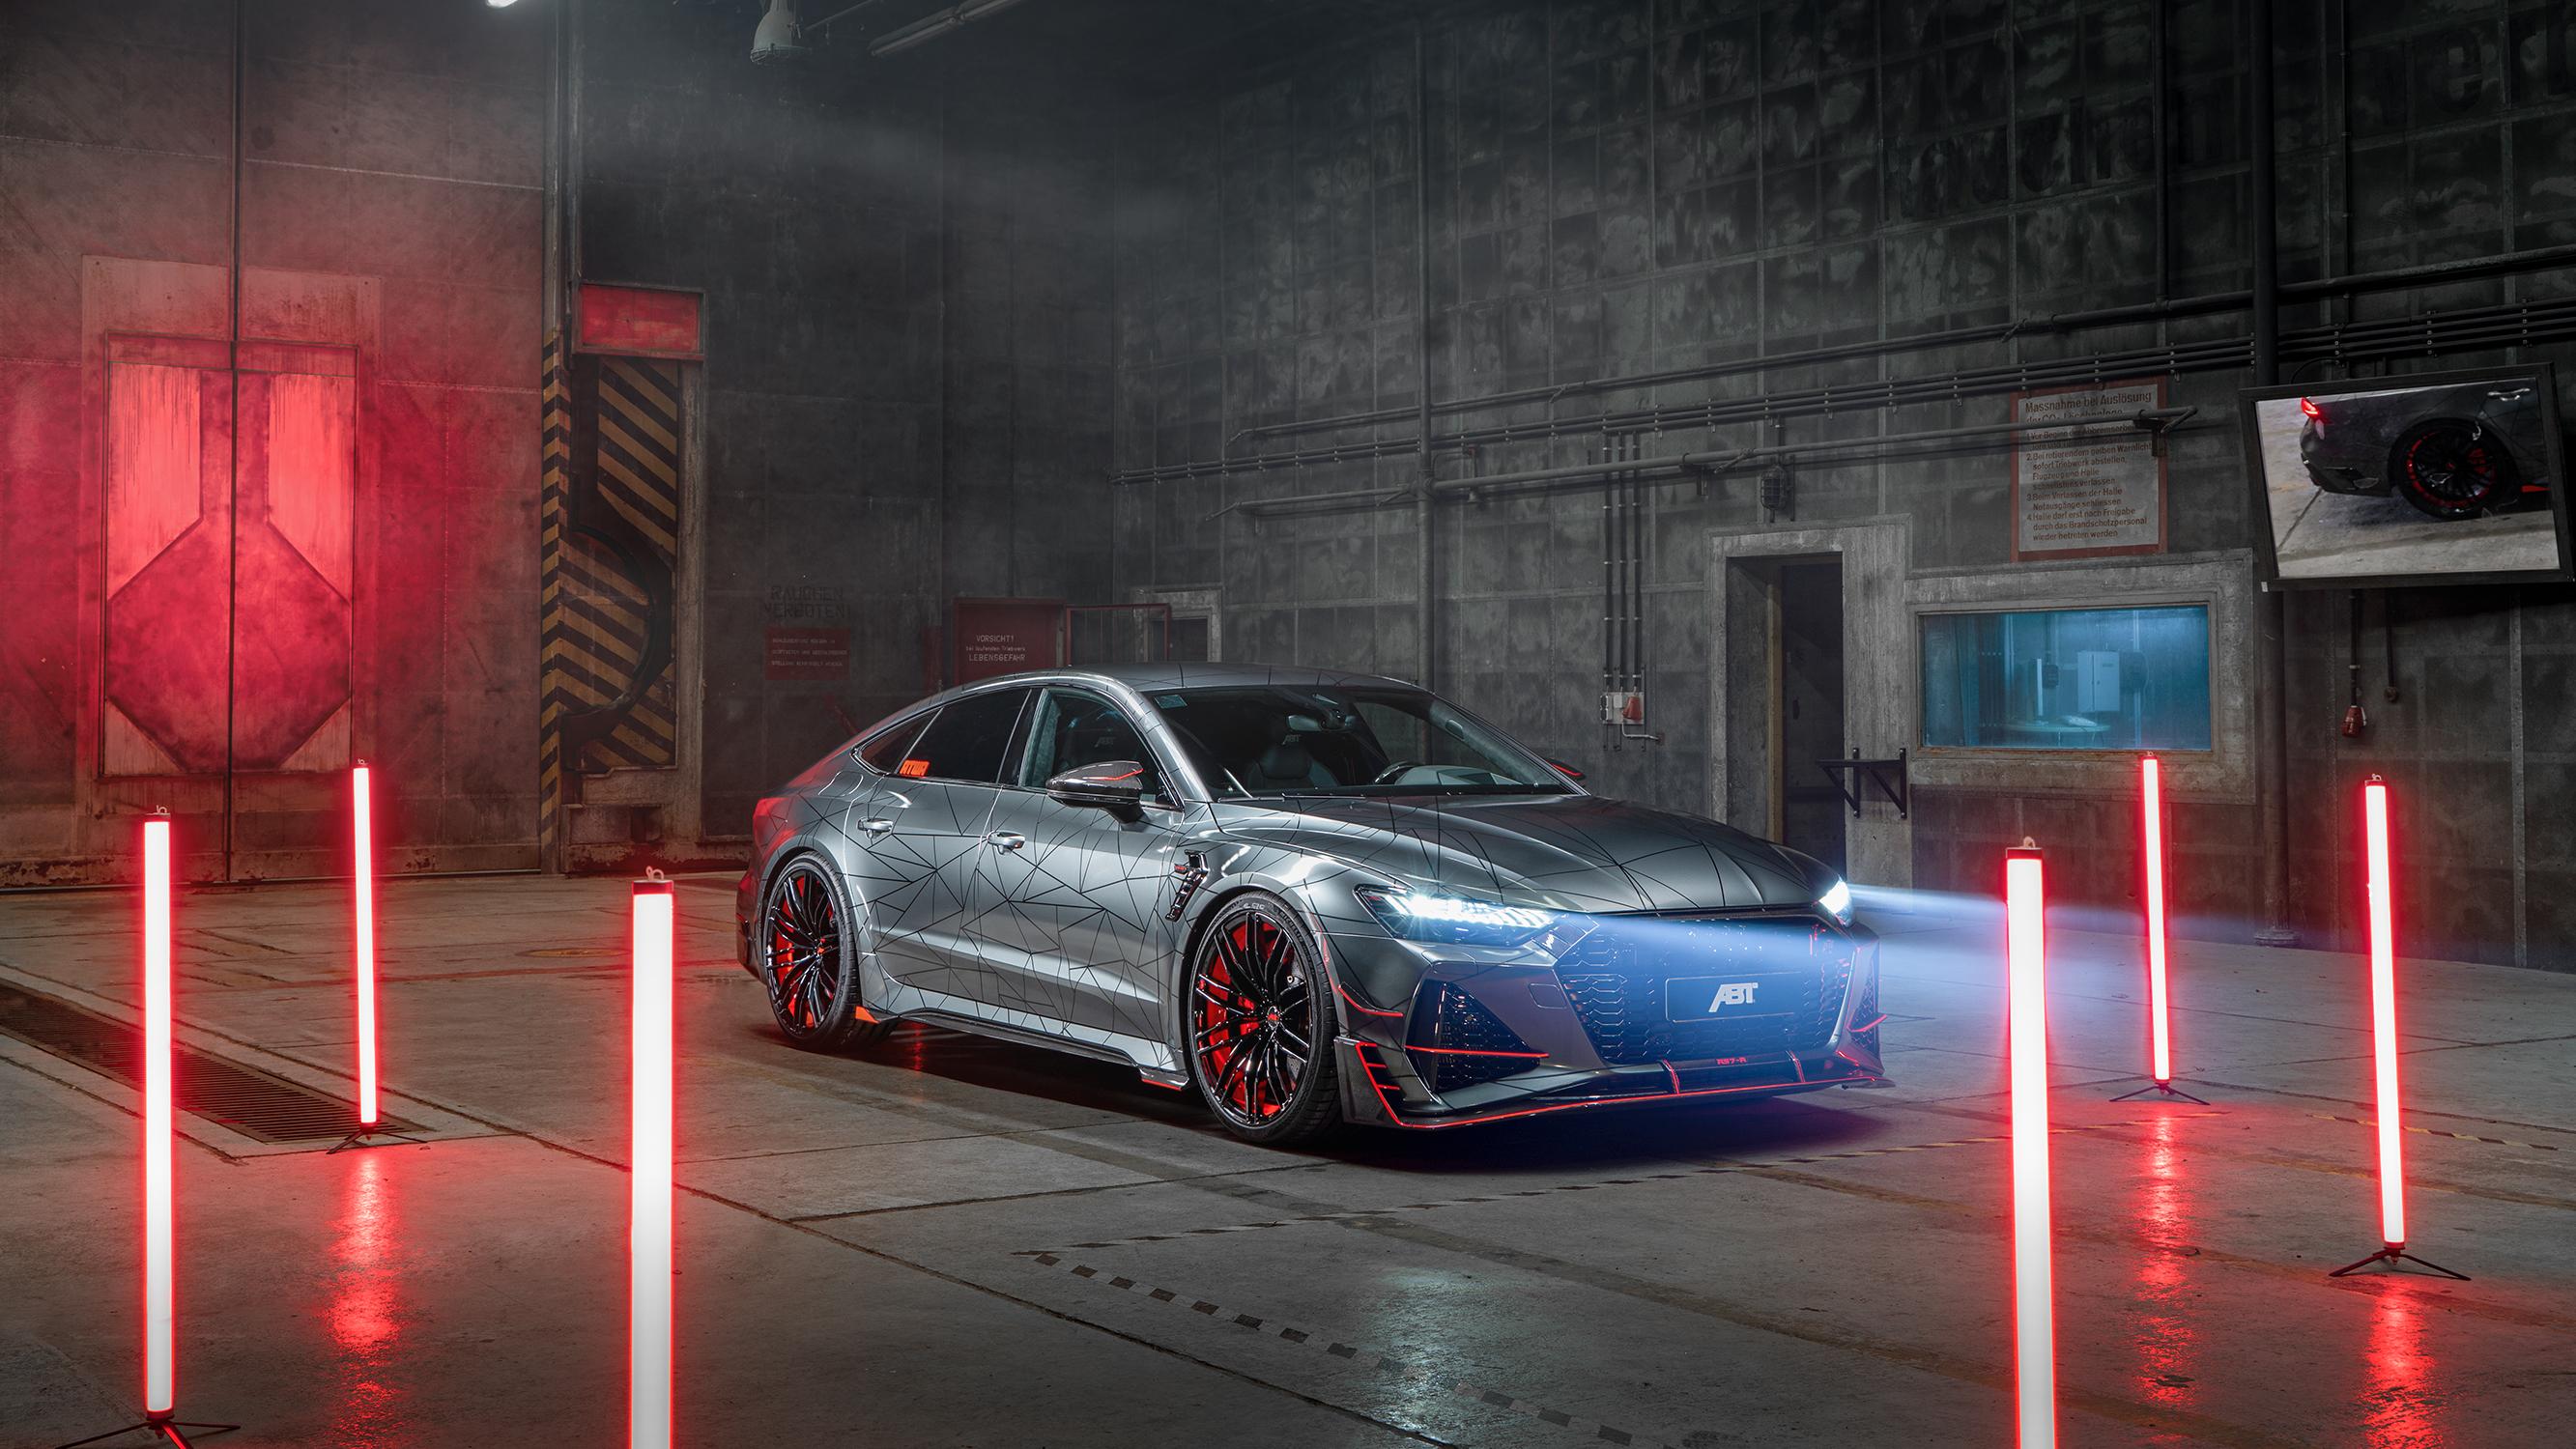 Audi Rs7 Abt Daniel 2666x1500 Download Hd Wallpaper Wallpapertip